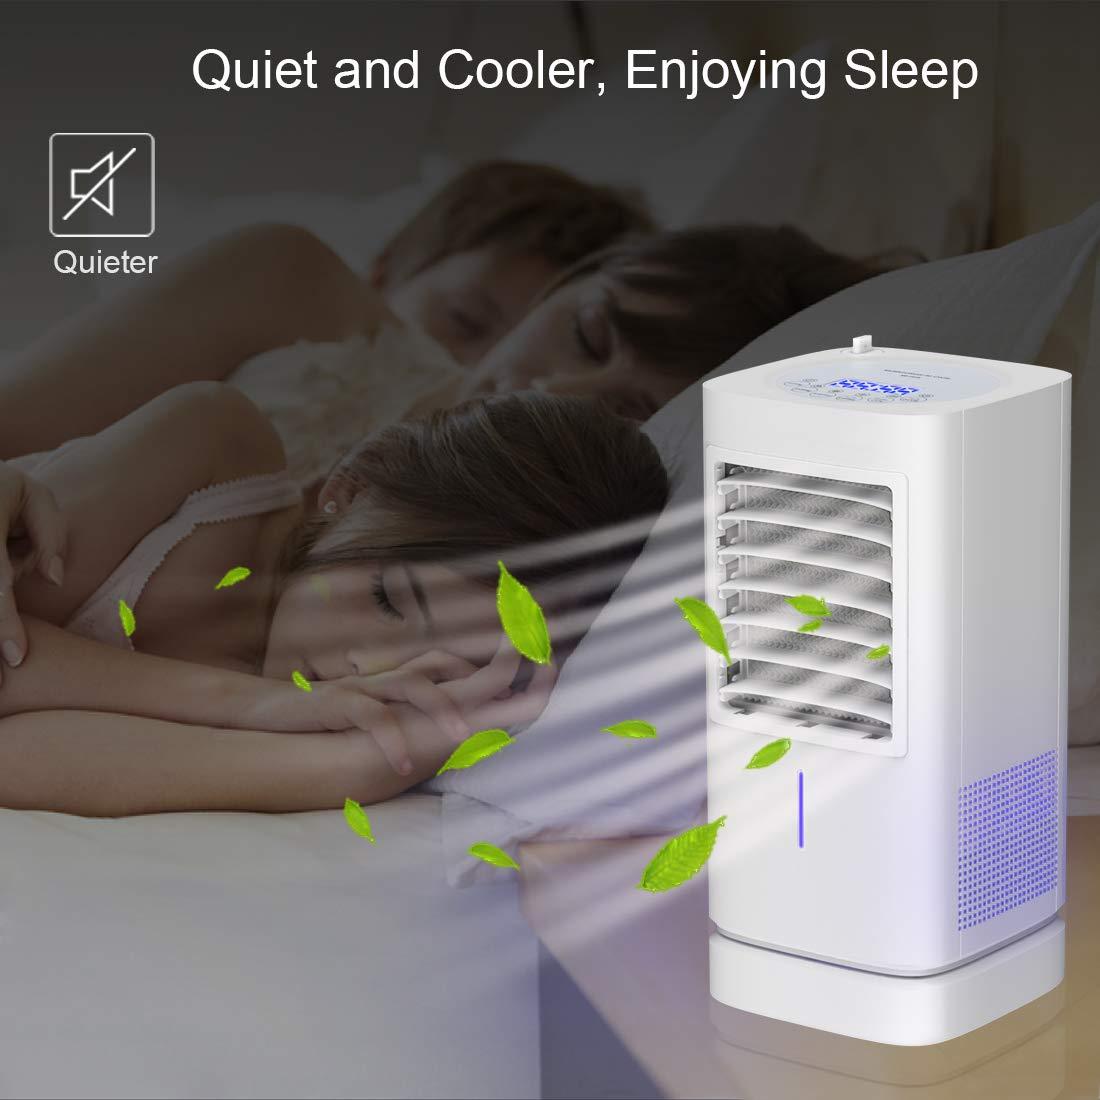 Multifunktionaler Air Cooler Klimaanlagee,Moving Desktop Cooling Fan mit Timer//Licht f/ür Home Office Schlafzimmer